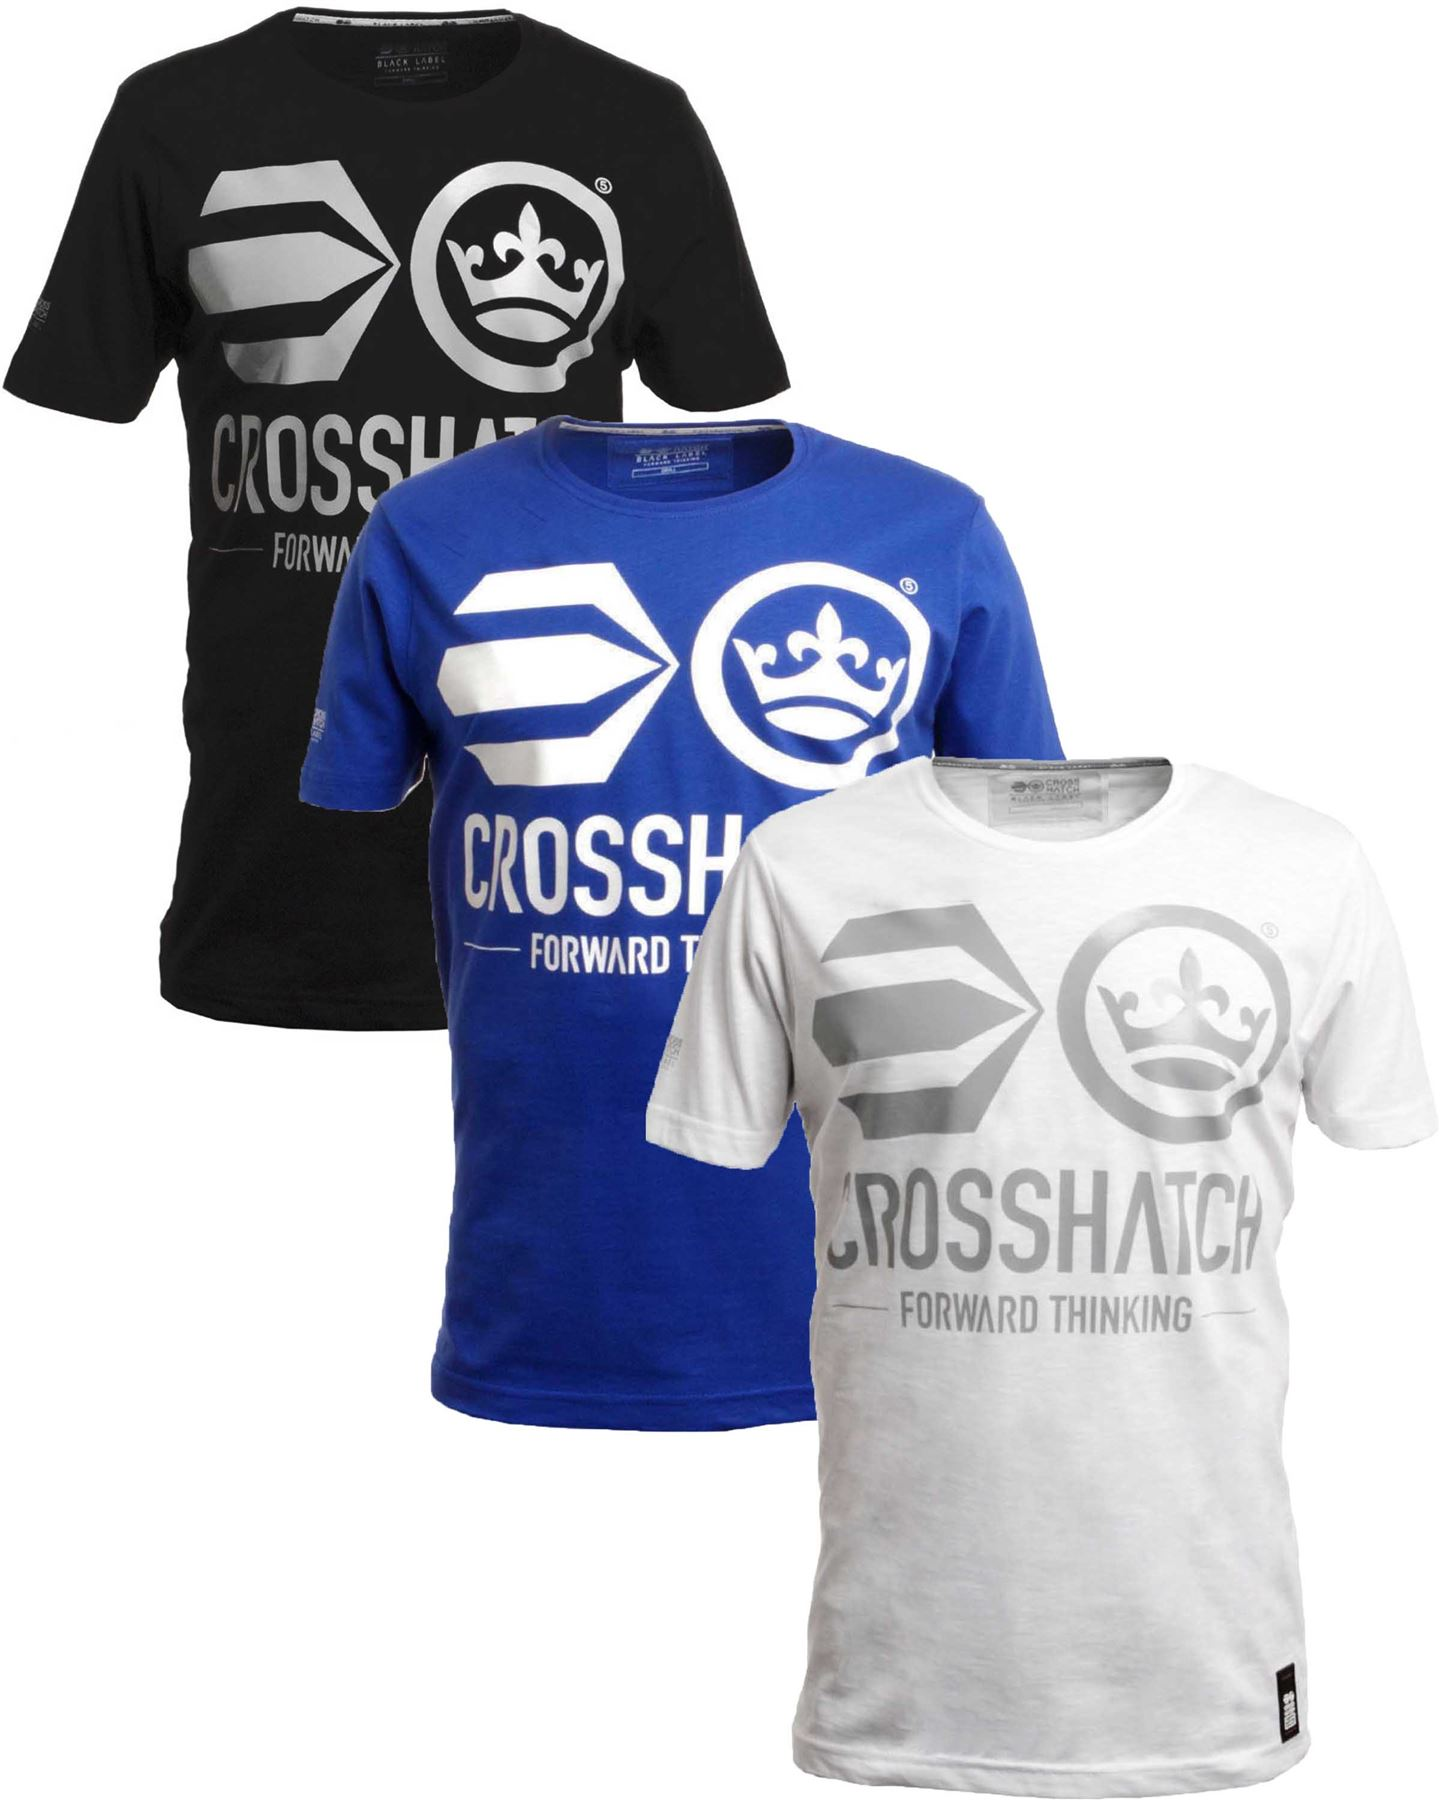 bnwt mens crosshatch graphic antler slub cotton t shirt black blue